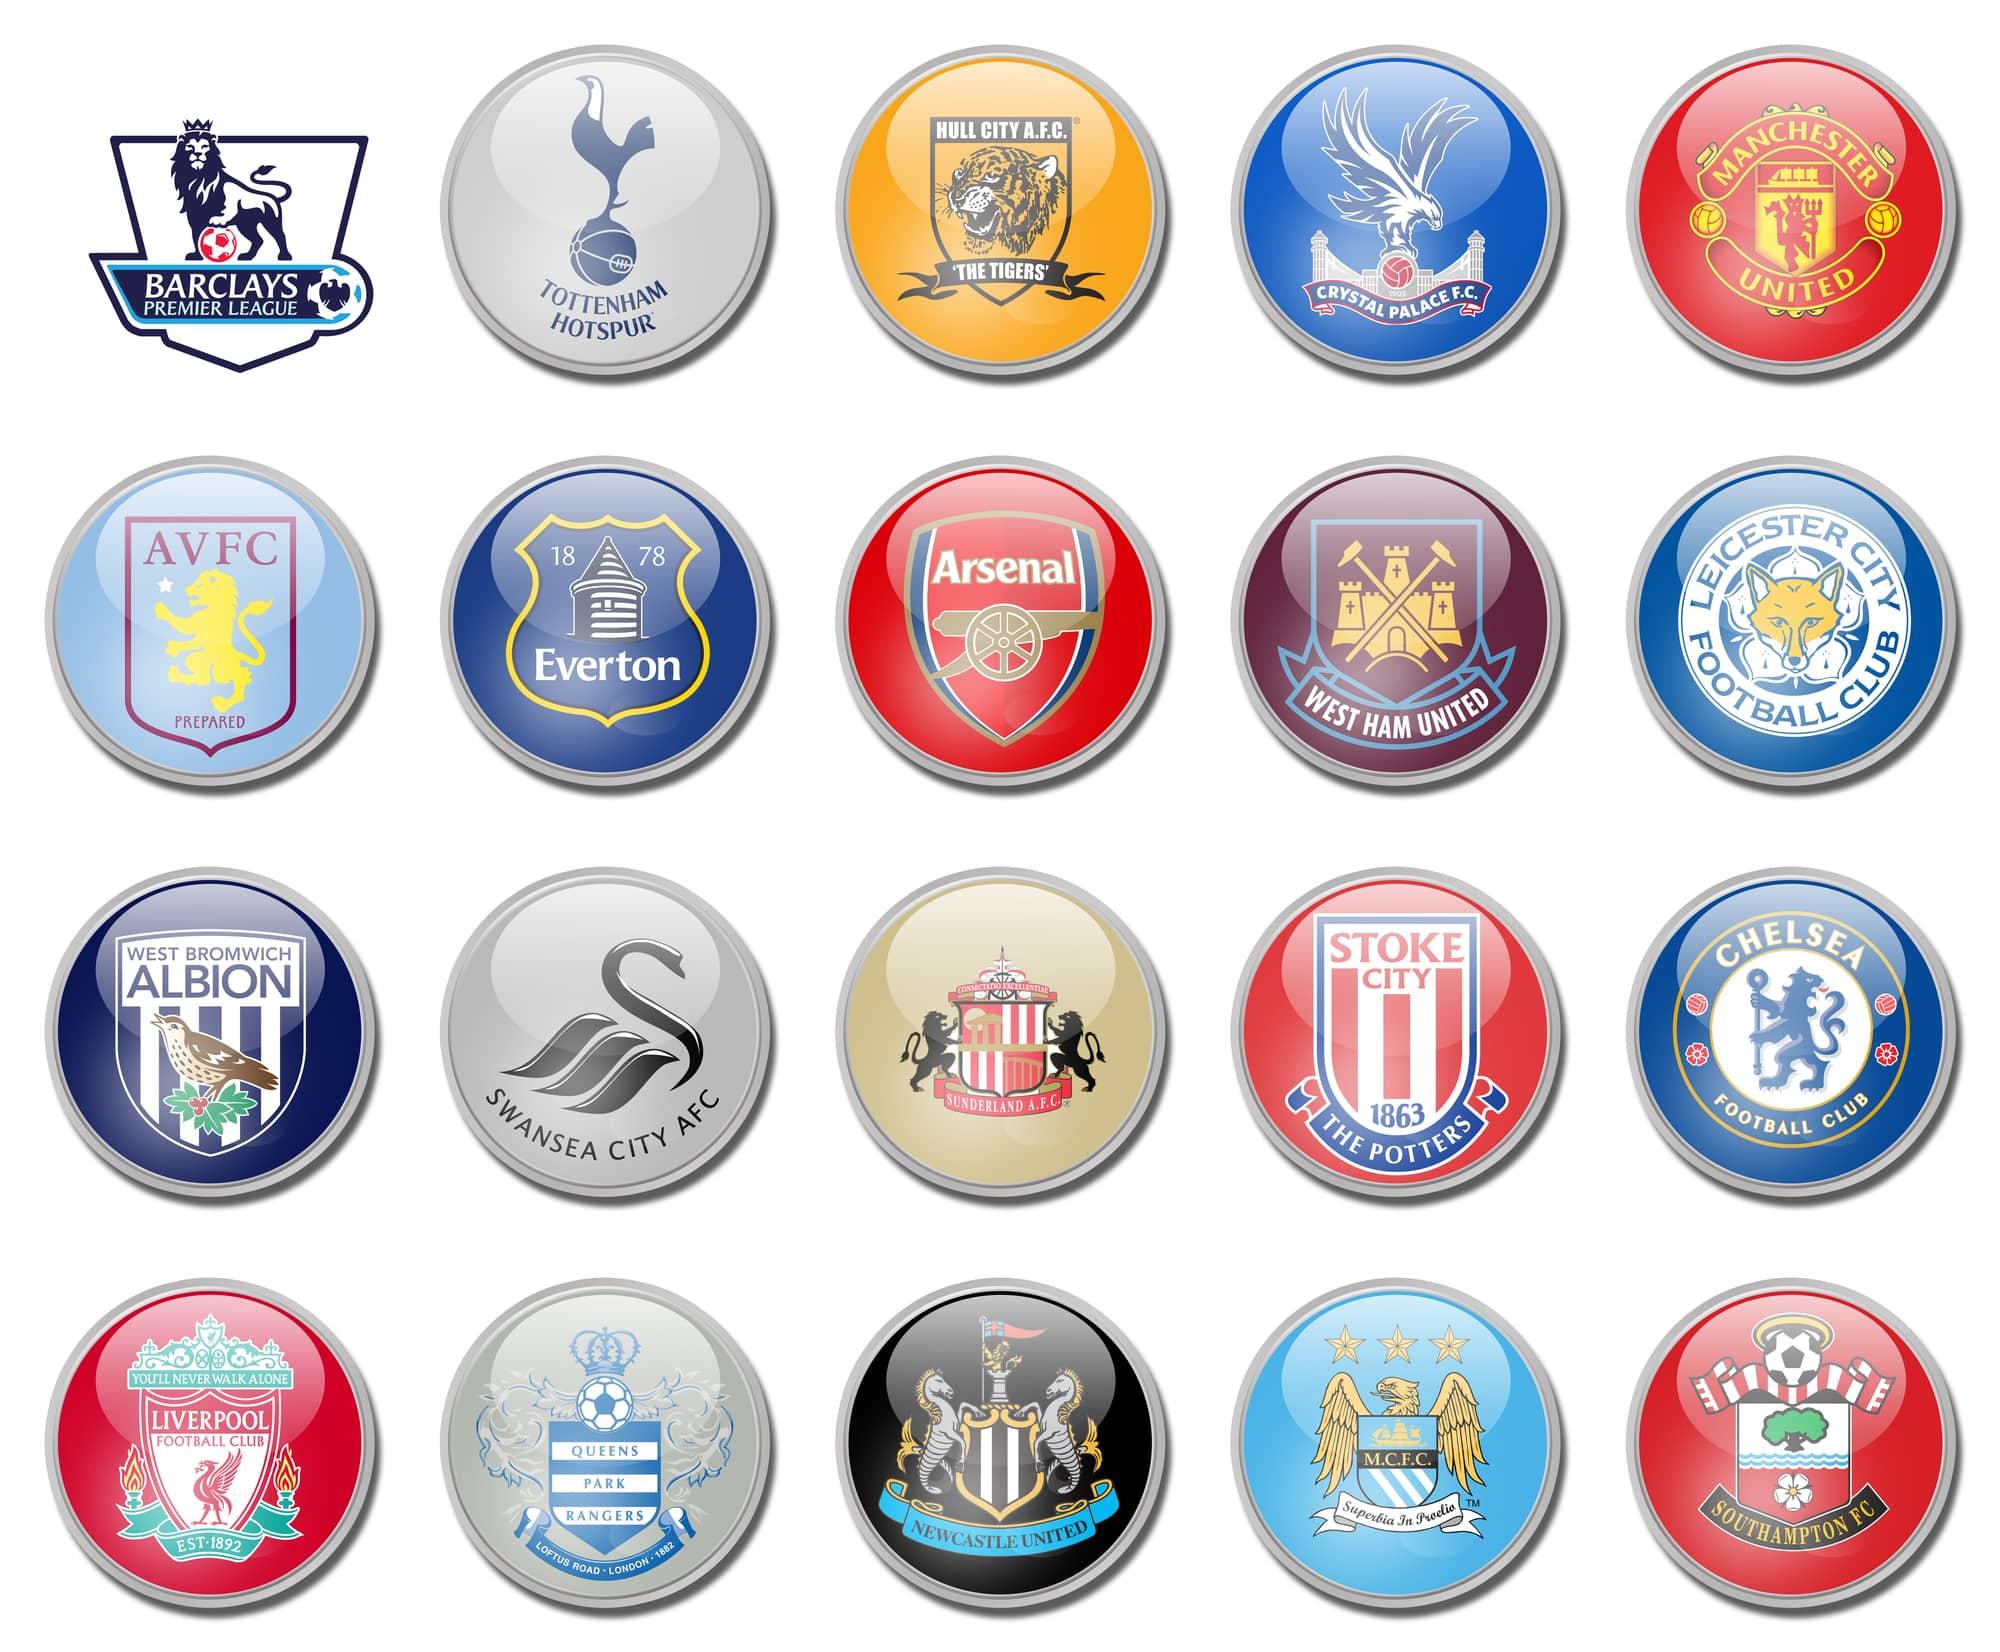 Premier League Restart set for June 17